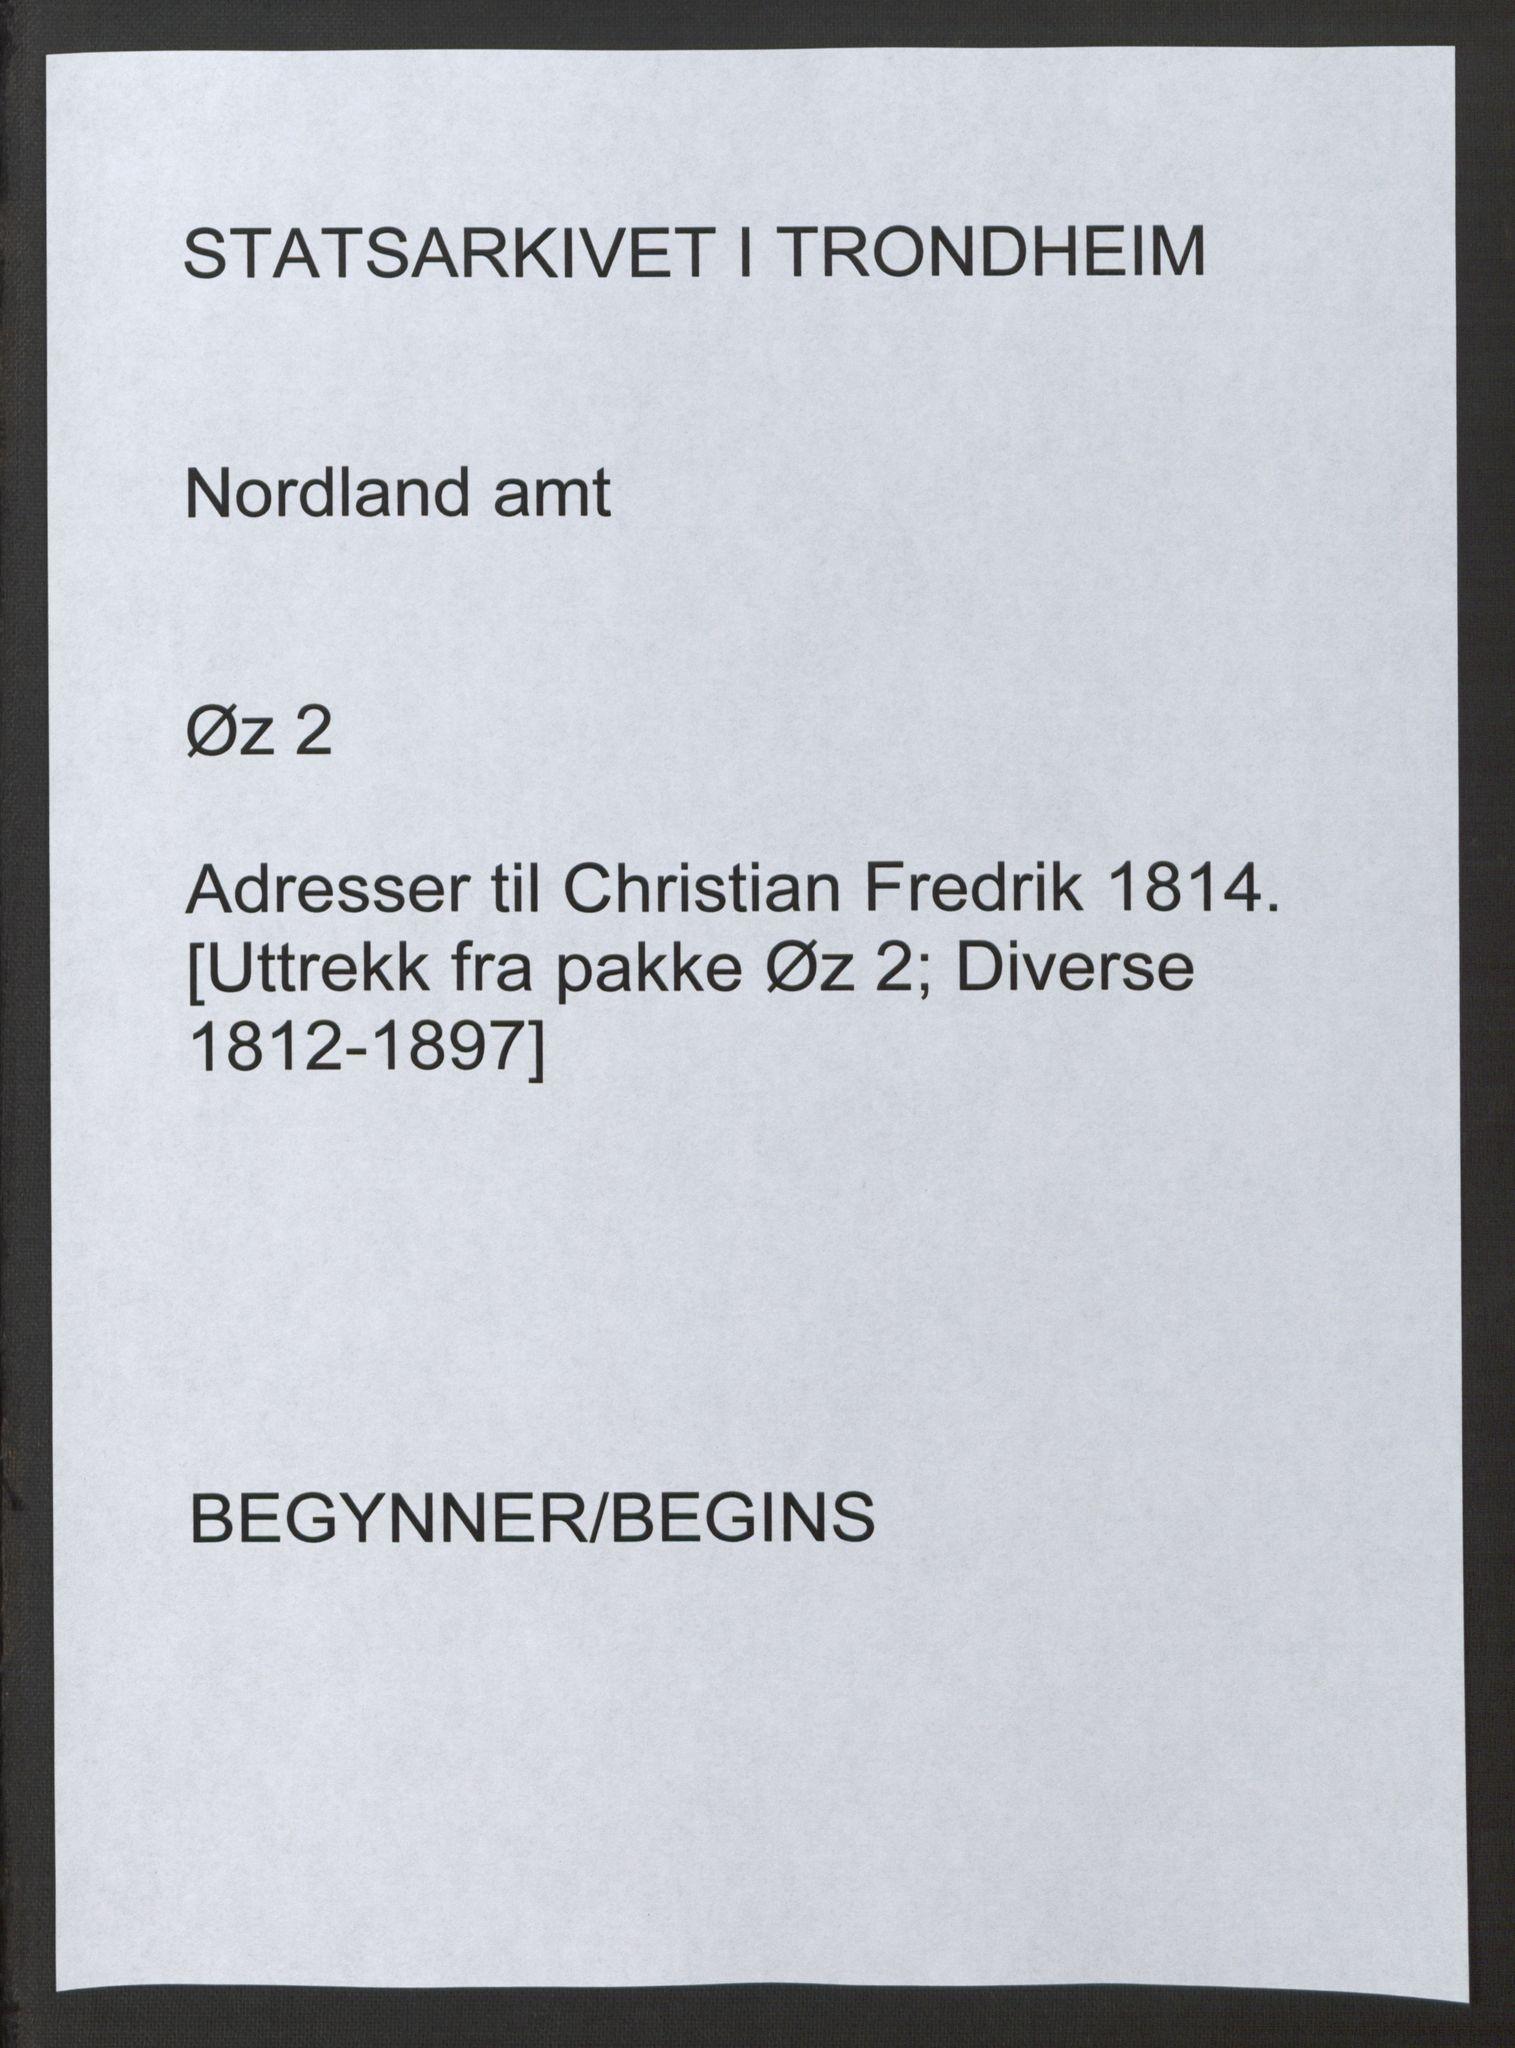 SAT, Nordland amt/fylke*, 1814, s. 1